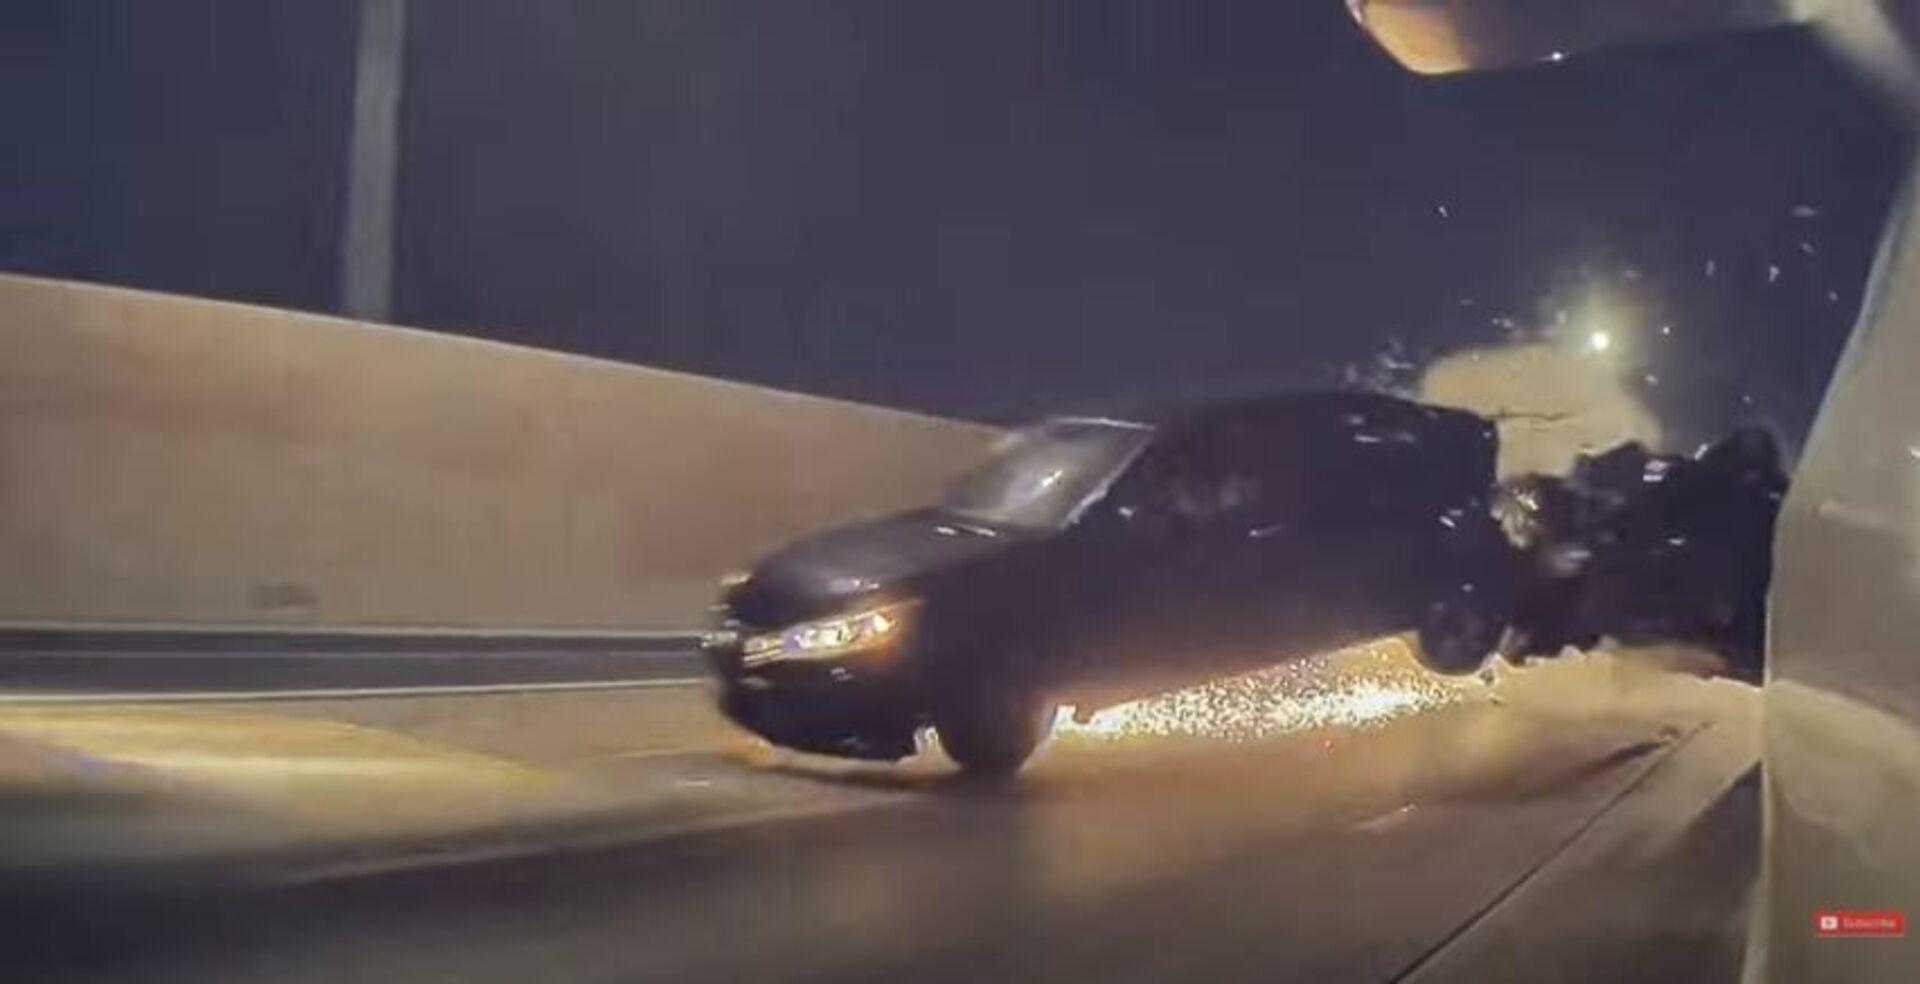 Dodge Challenger κάνει κόντρα με Tesla Model 3 και πέφτει πάνω σε άλλο αμάξι - Sputnik Ελλάδα, 1920, 03.02.2021